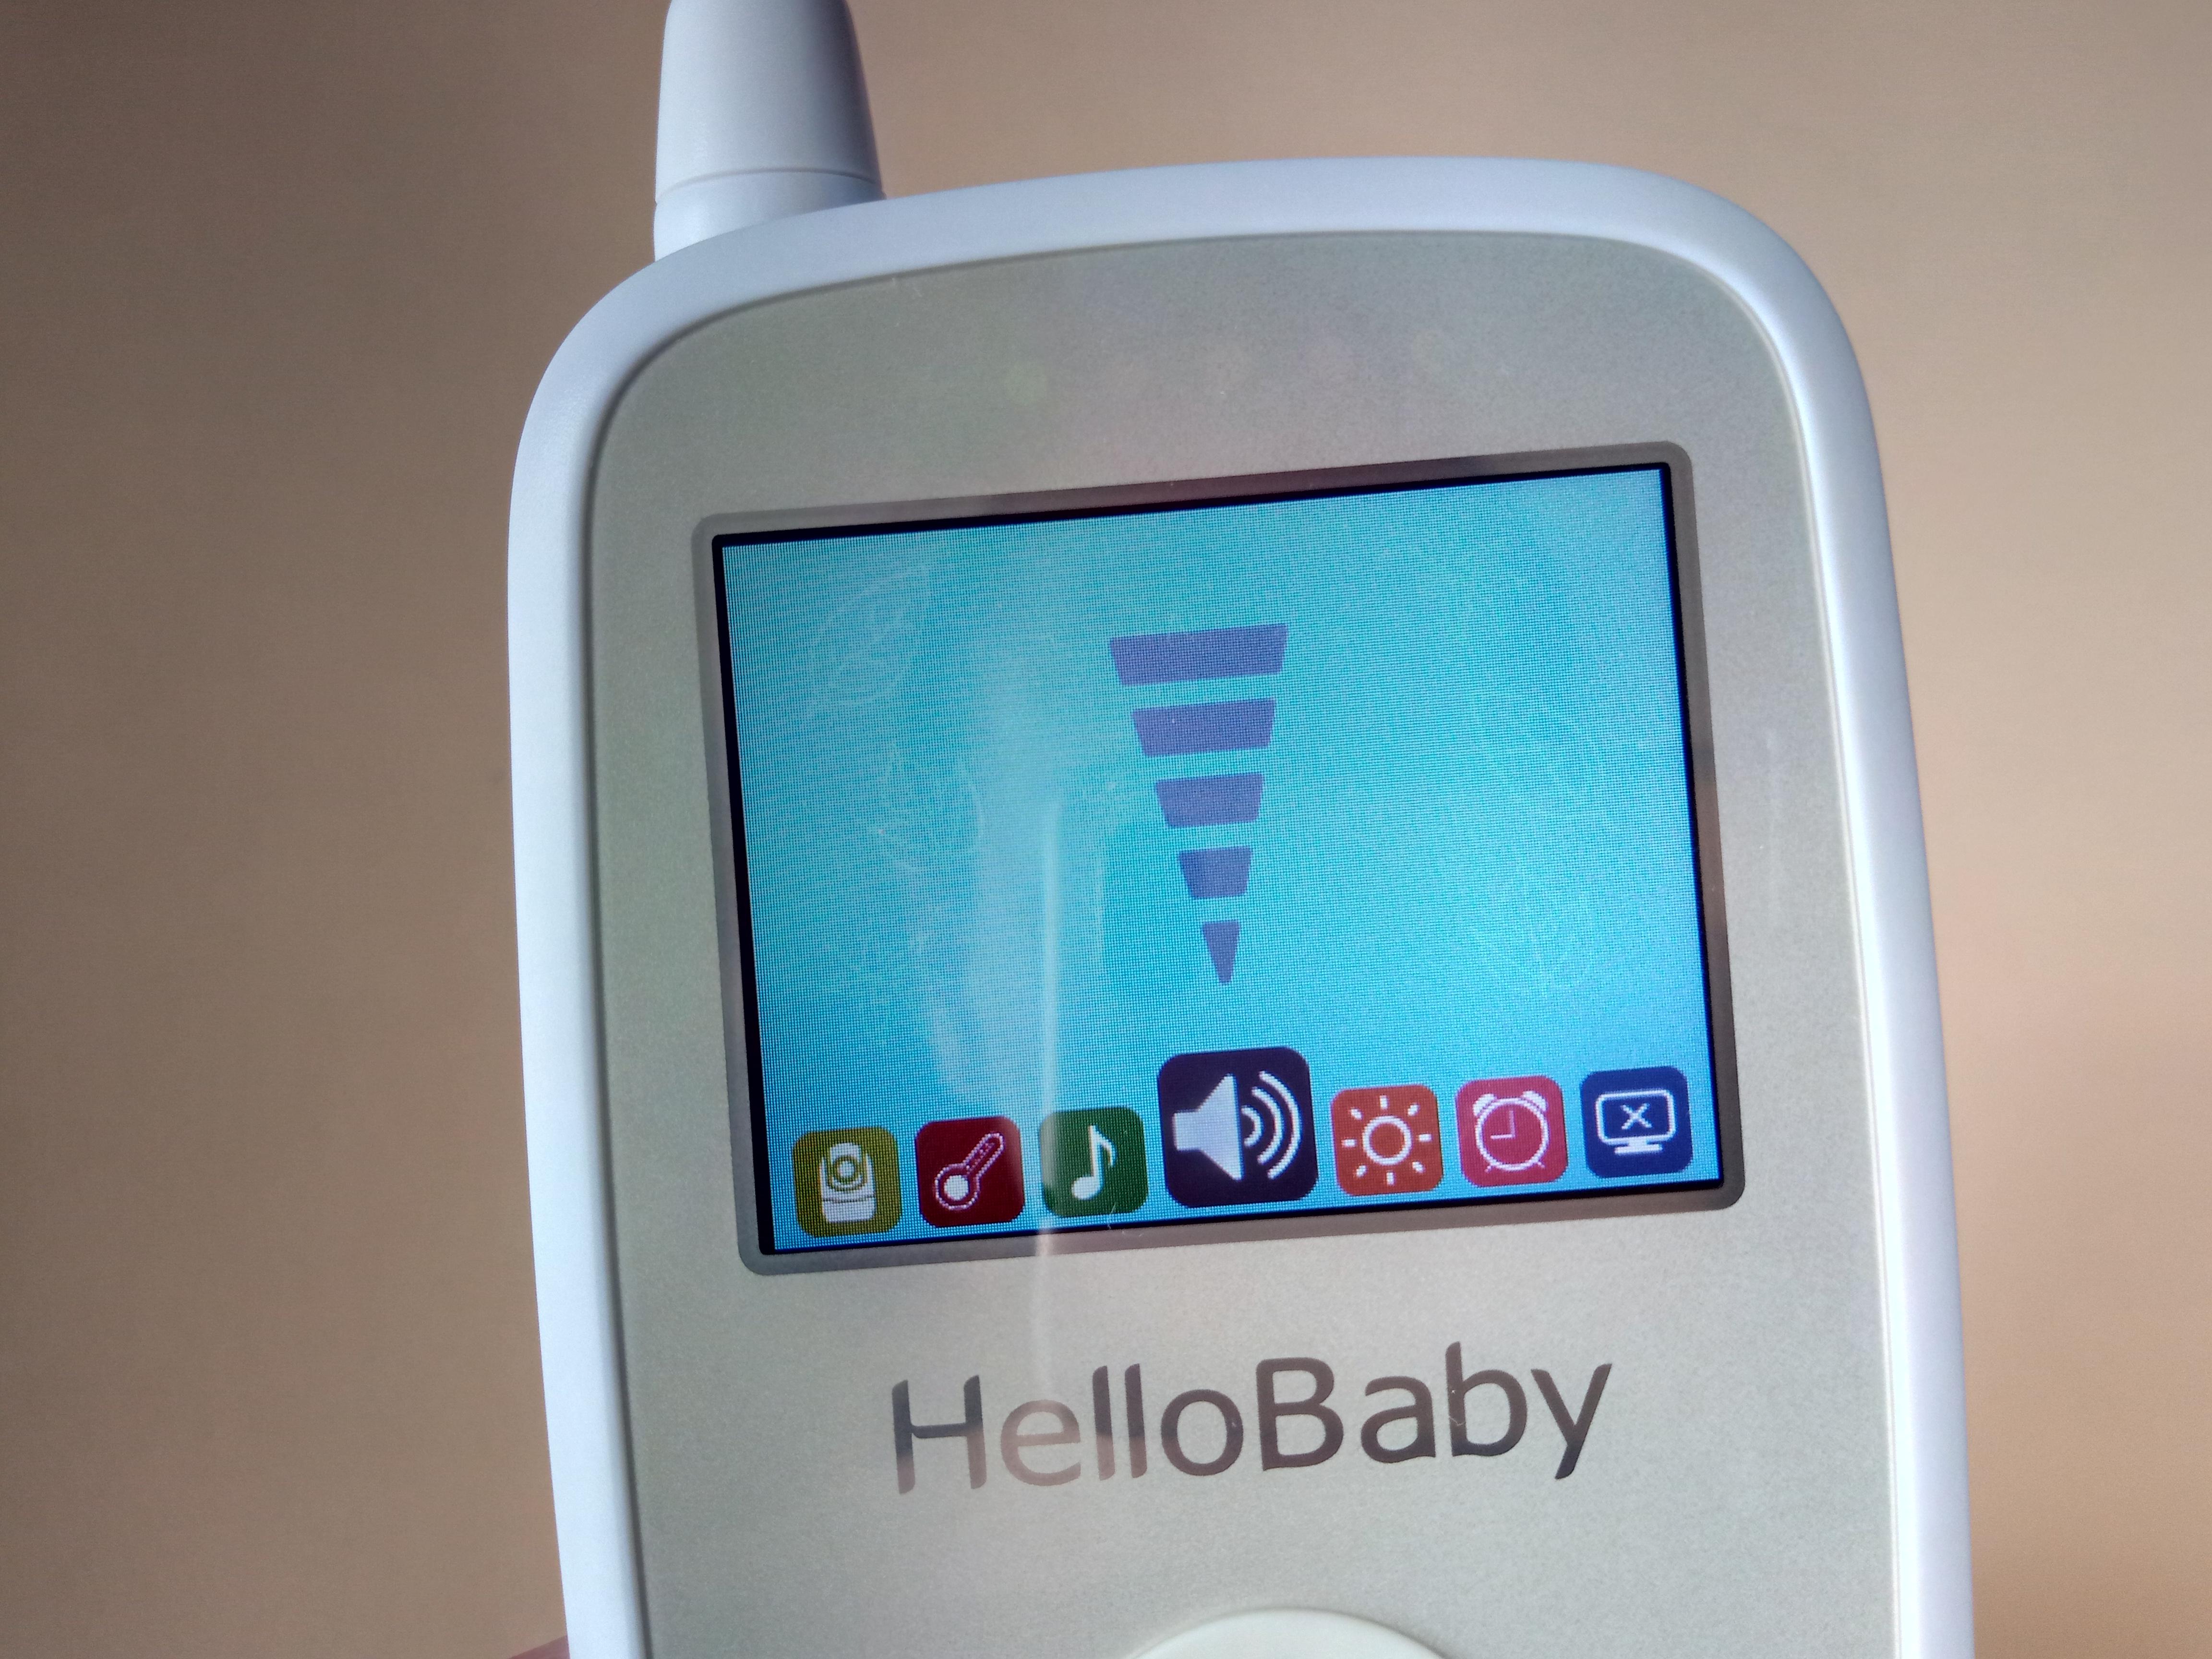 Видеоняня HelloBaby HB248 купить